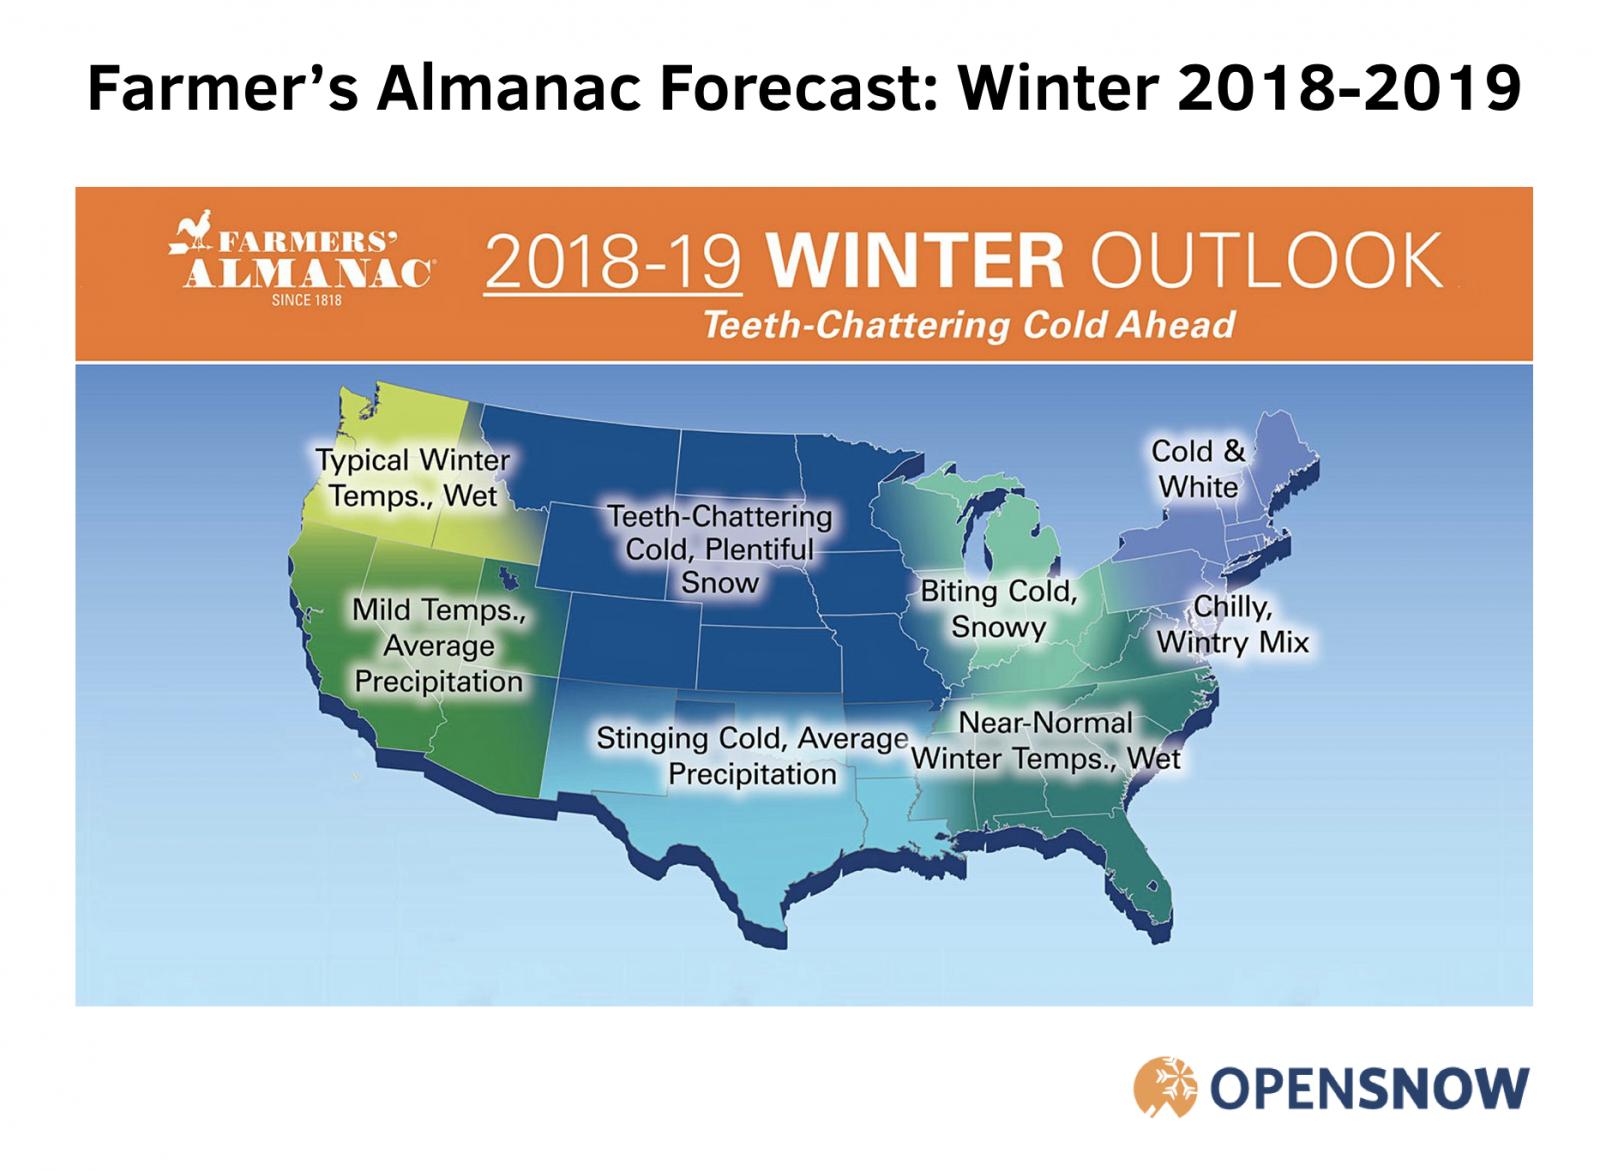 Farmer's Almanac 2018-2019 Winter Forecast | OpenSnow